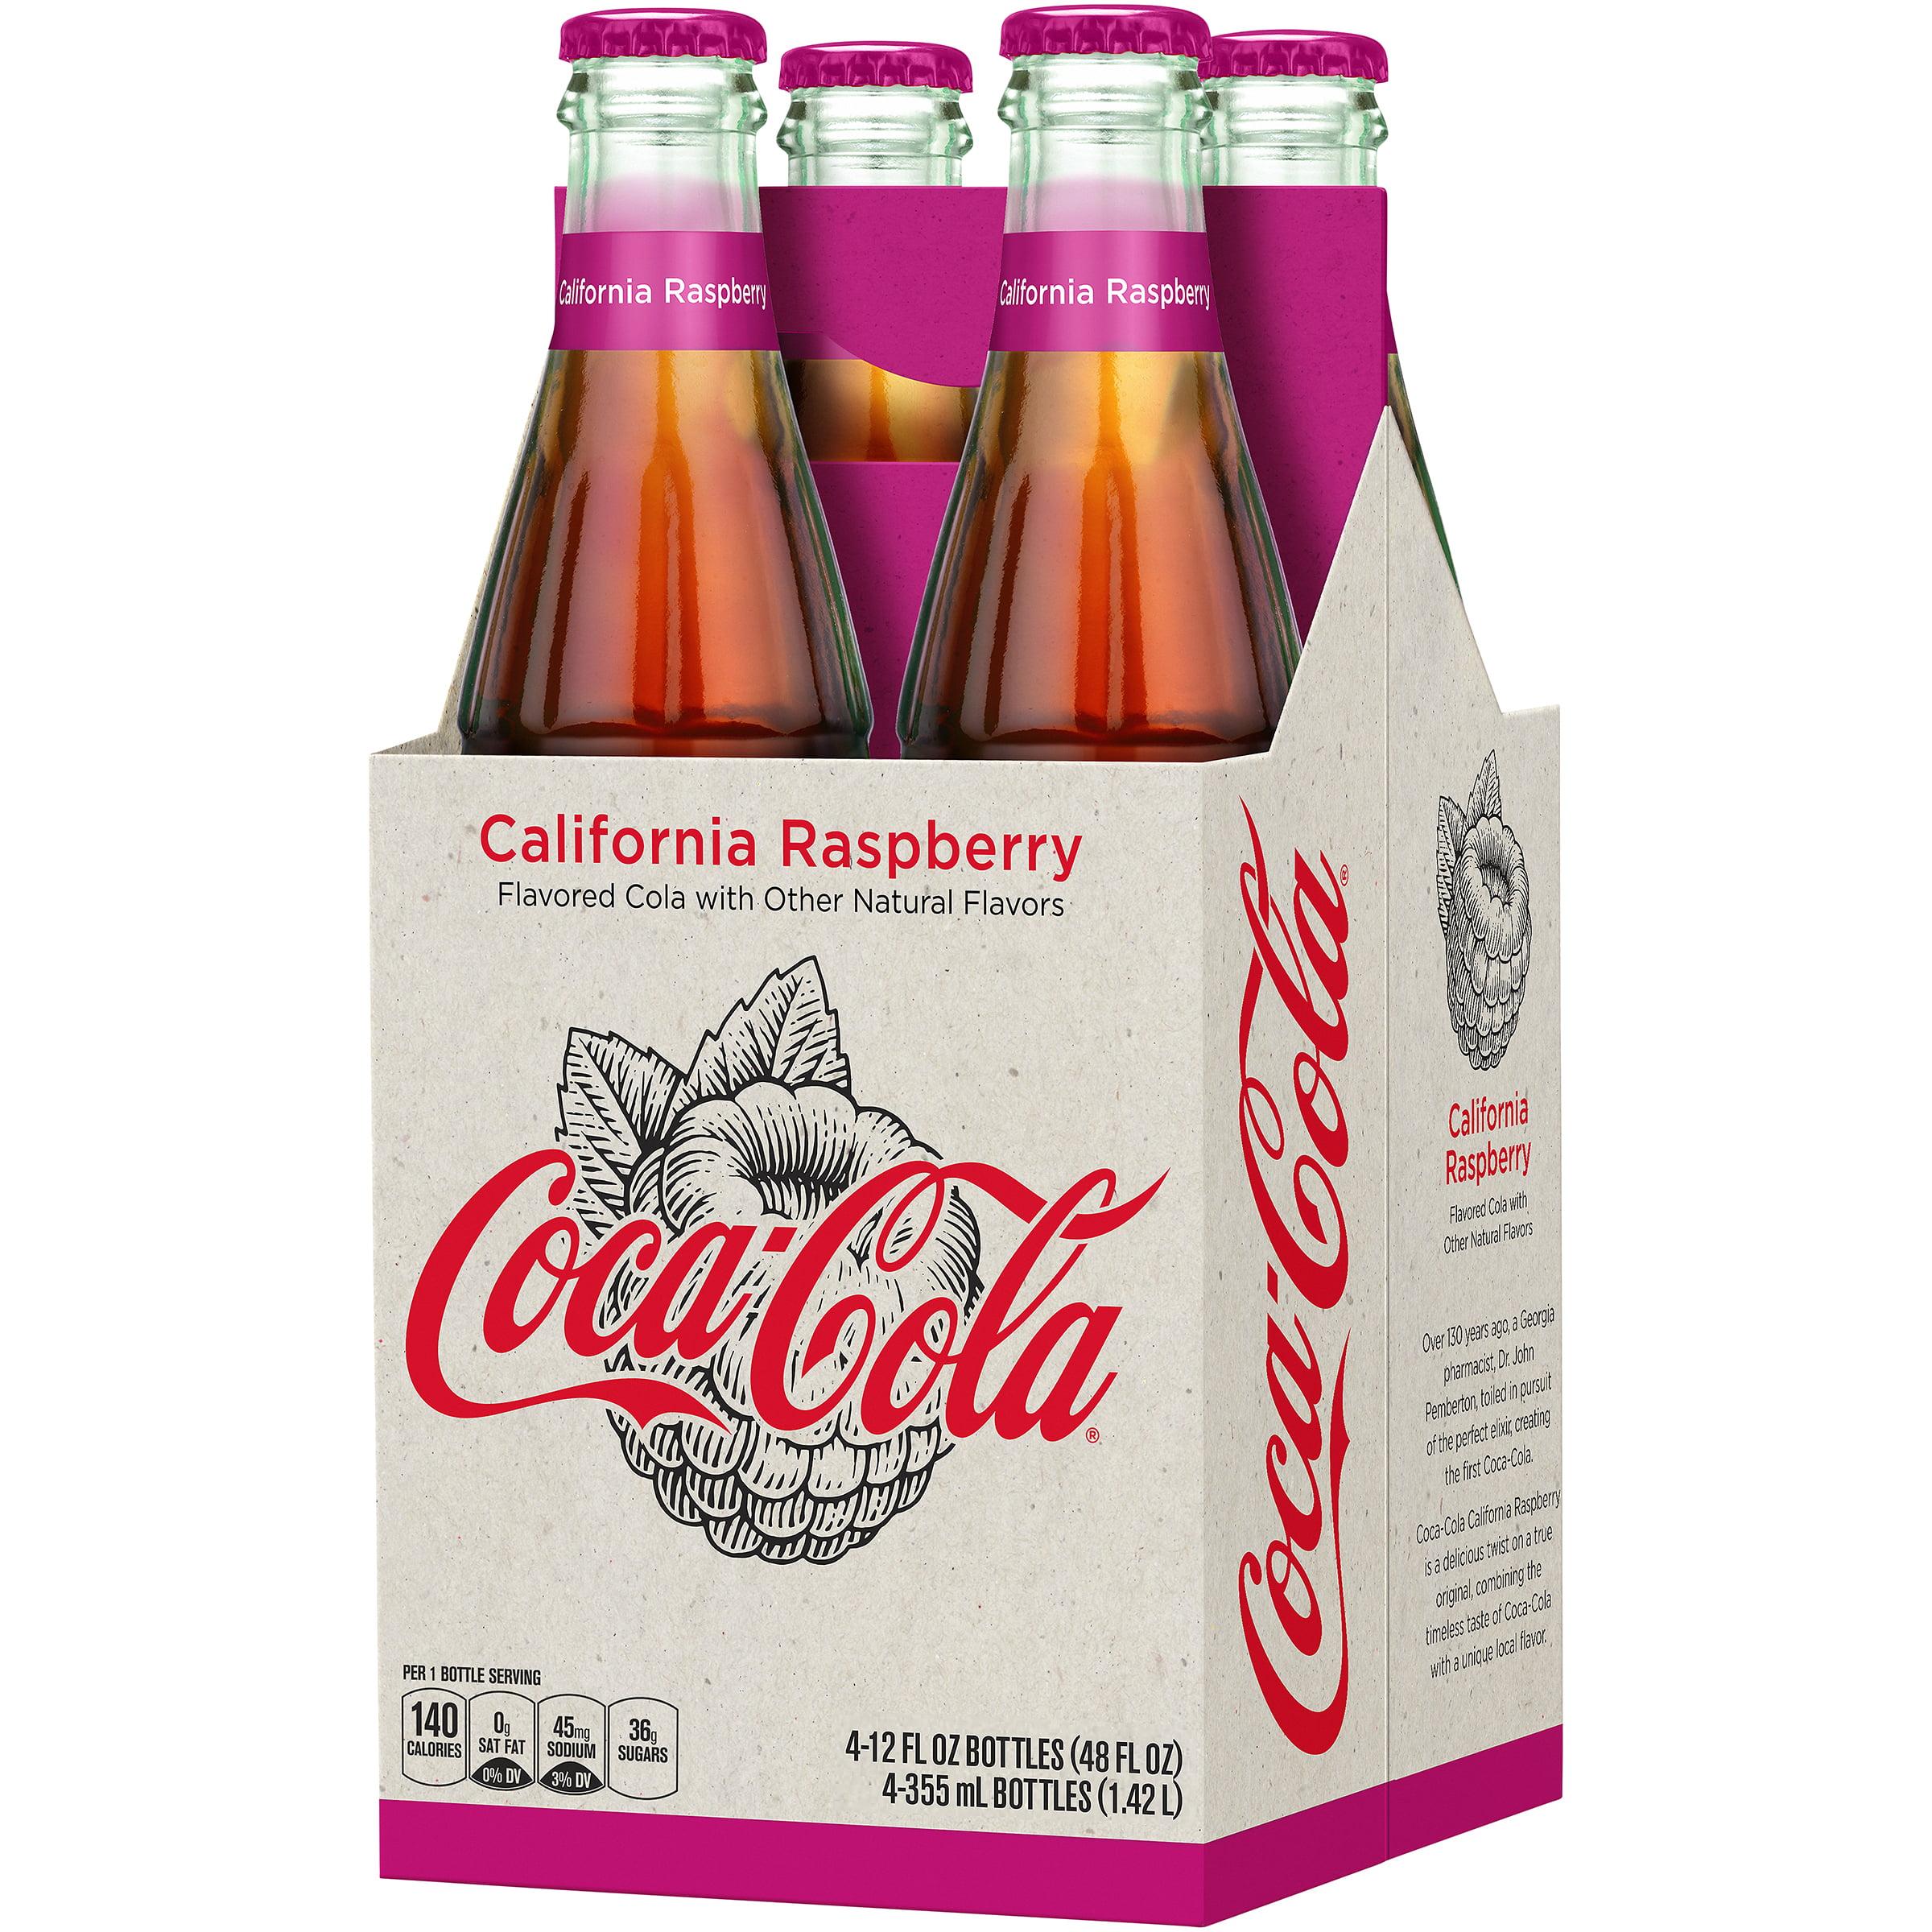 1c1a92975b2621 Coca-Cola Soda, California Raspberry, 12 Fl Oz, 4 Count - Walmart.com